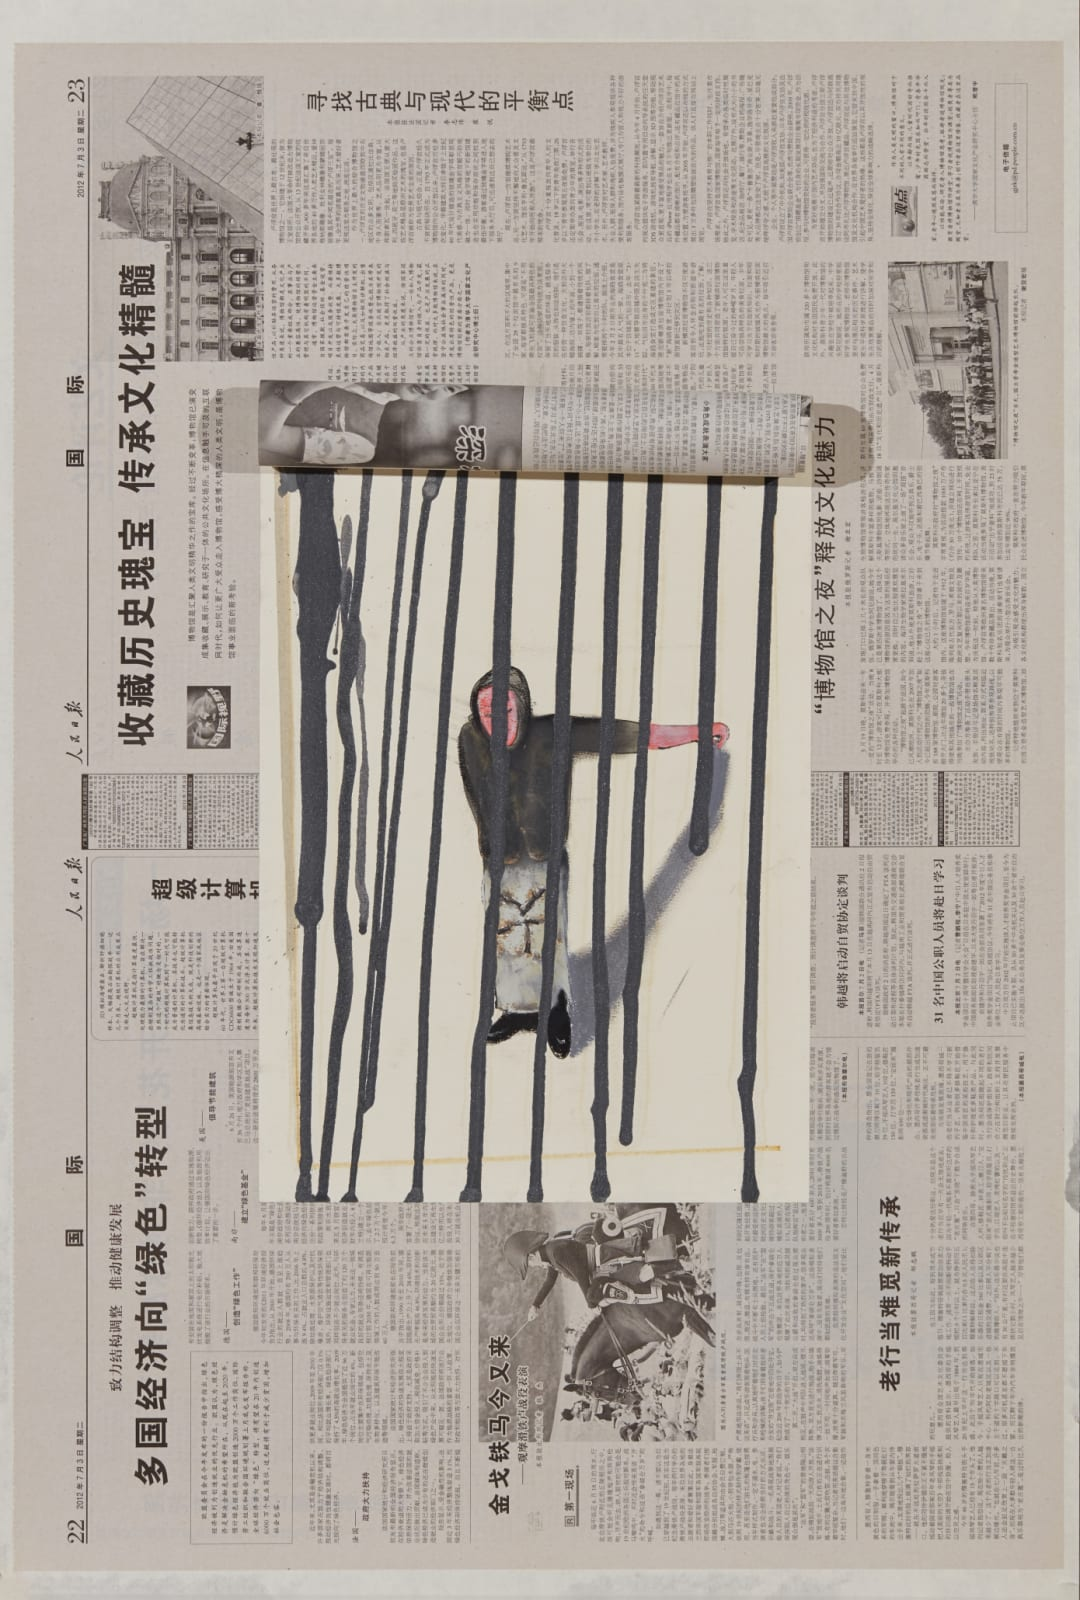 Chen Yujun, Ritual - Classic and Modern 现场仪式-古典与现代, 2007-2019